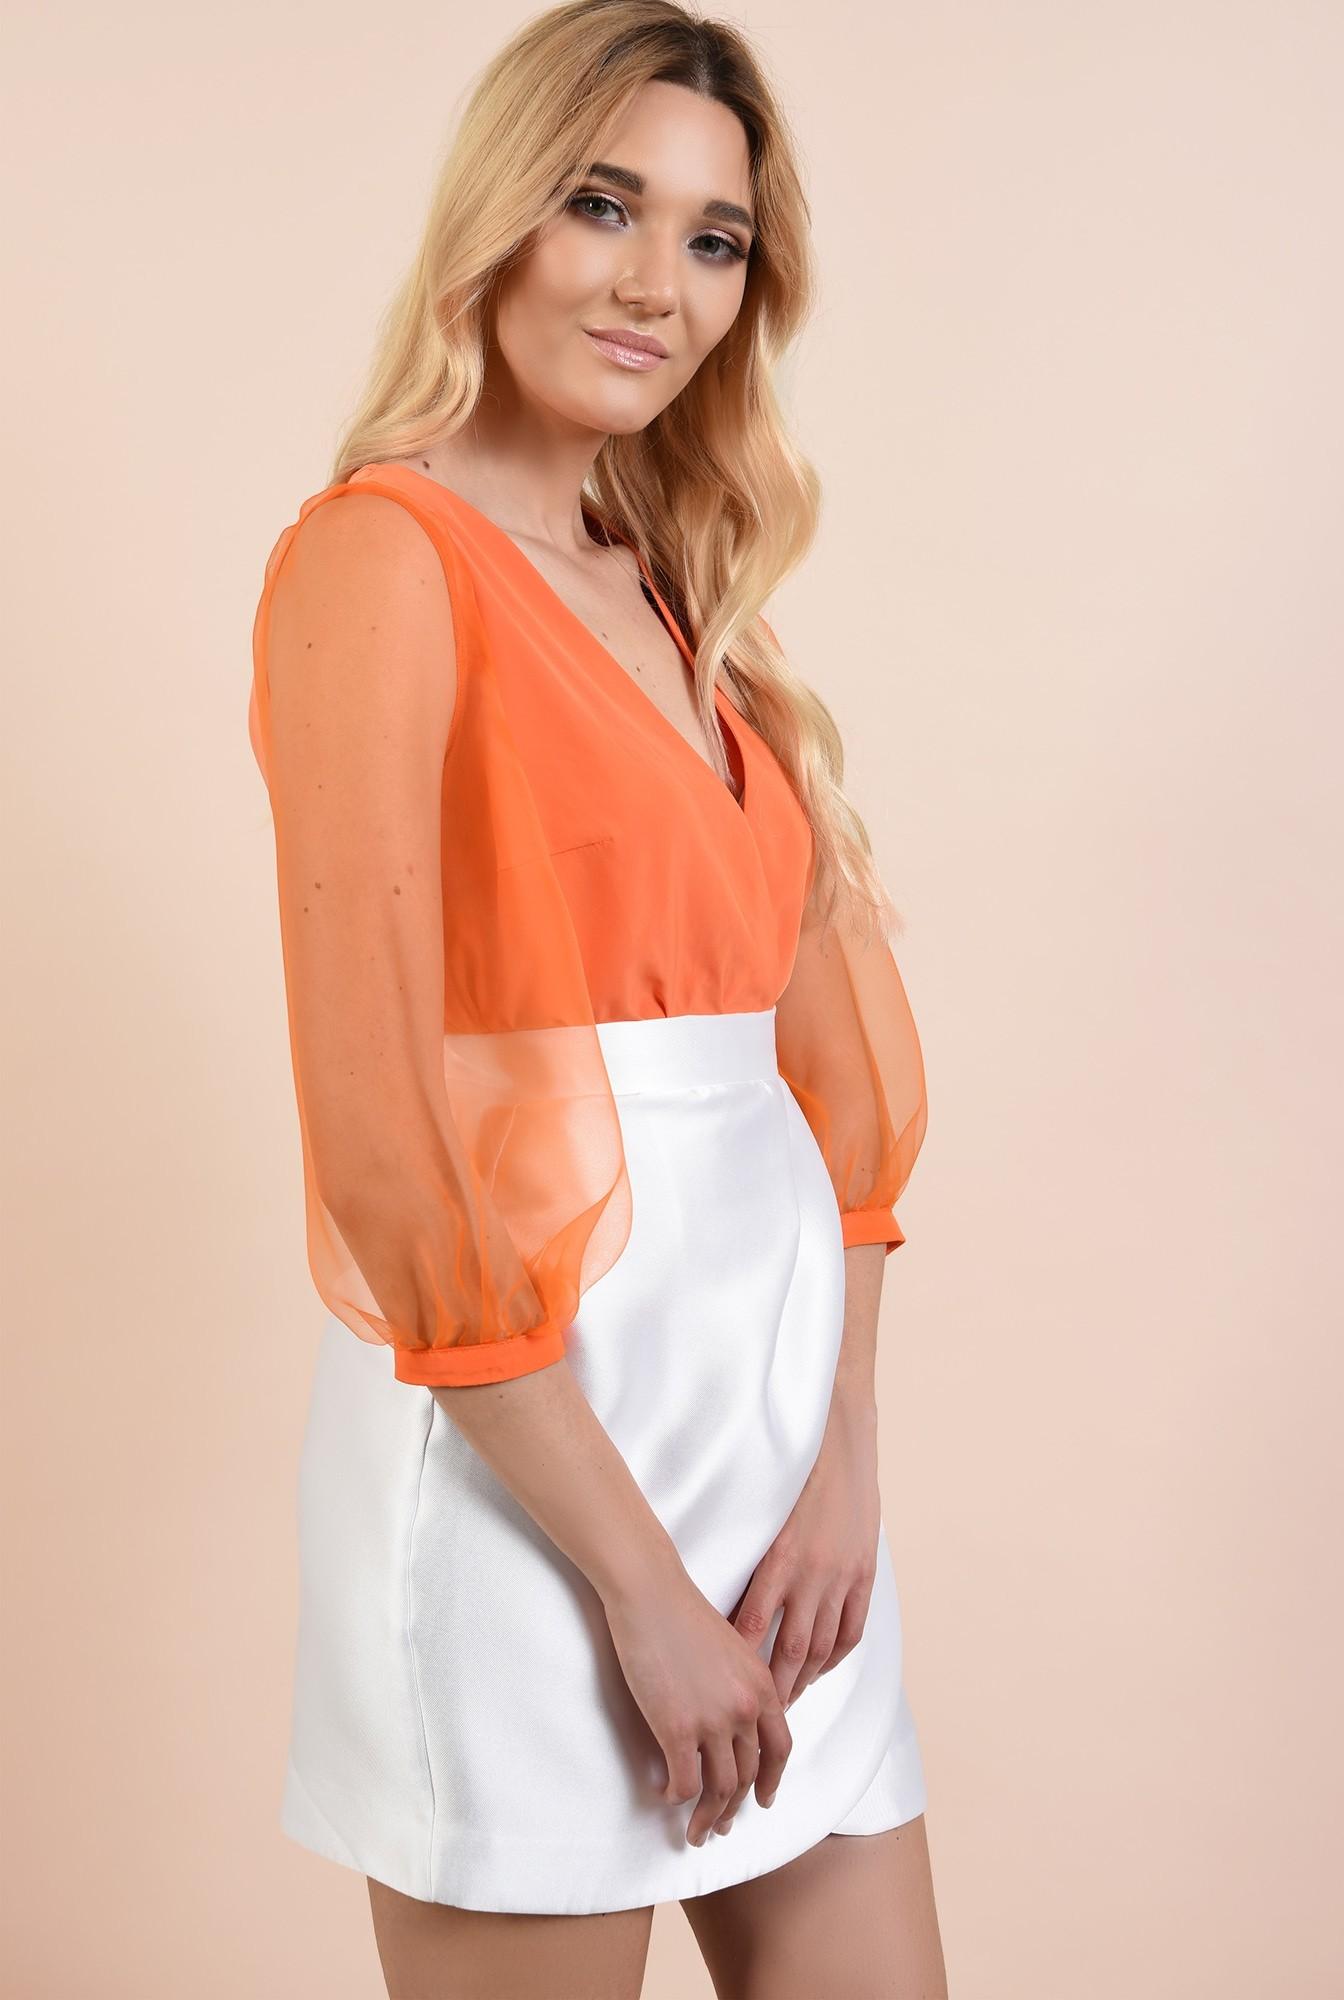 2 - bluza de ocazie, cu maneci bufante din organza, anchior petrecut, maneci transparente